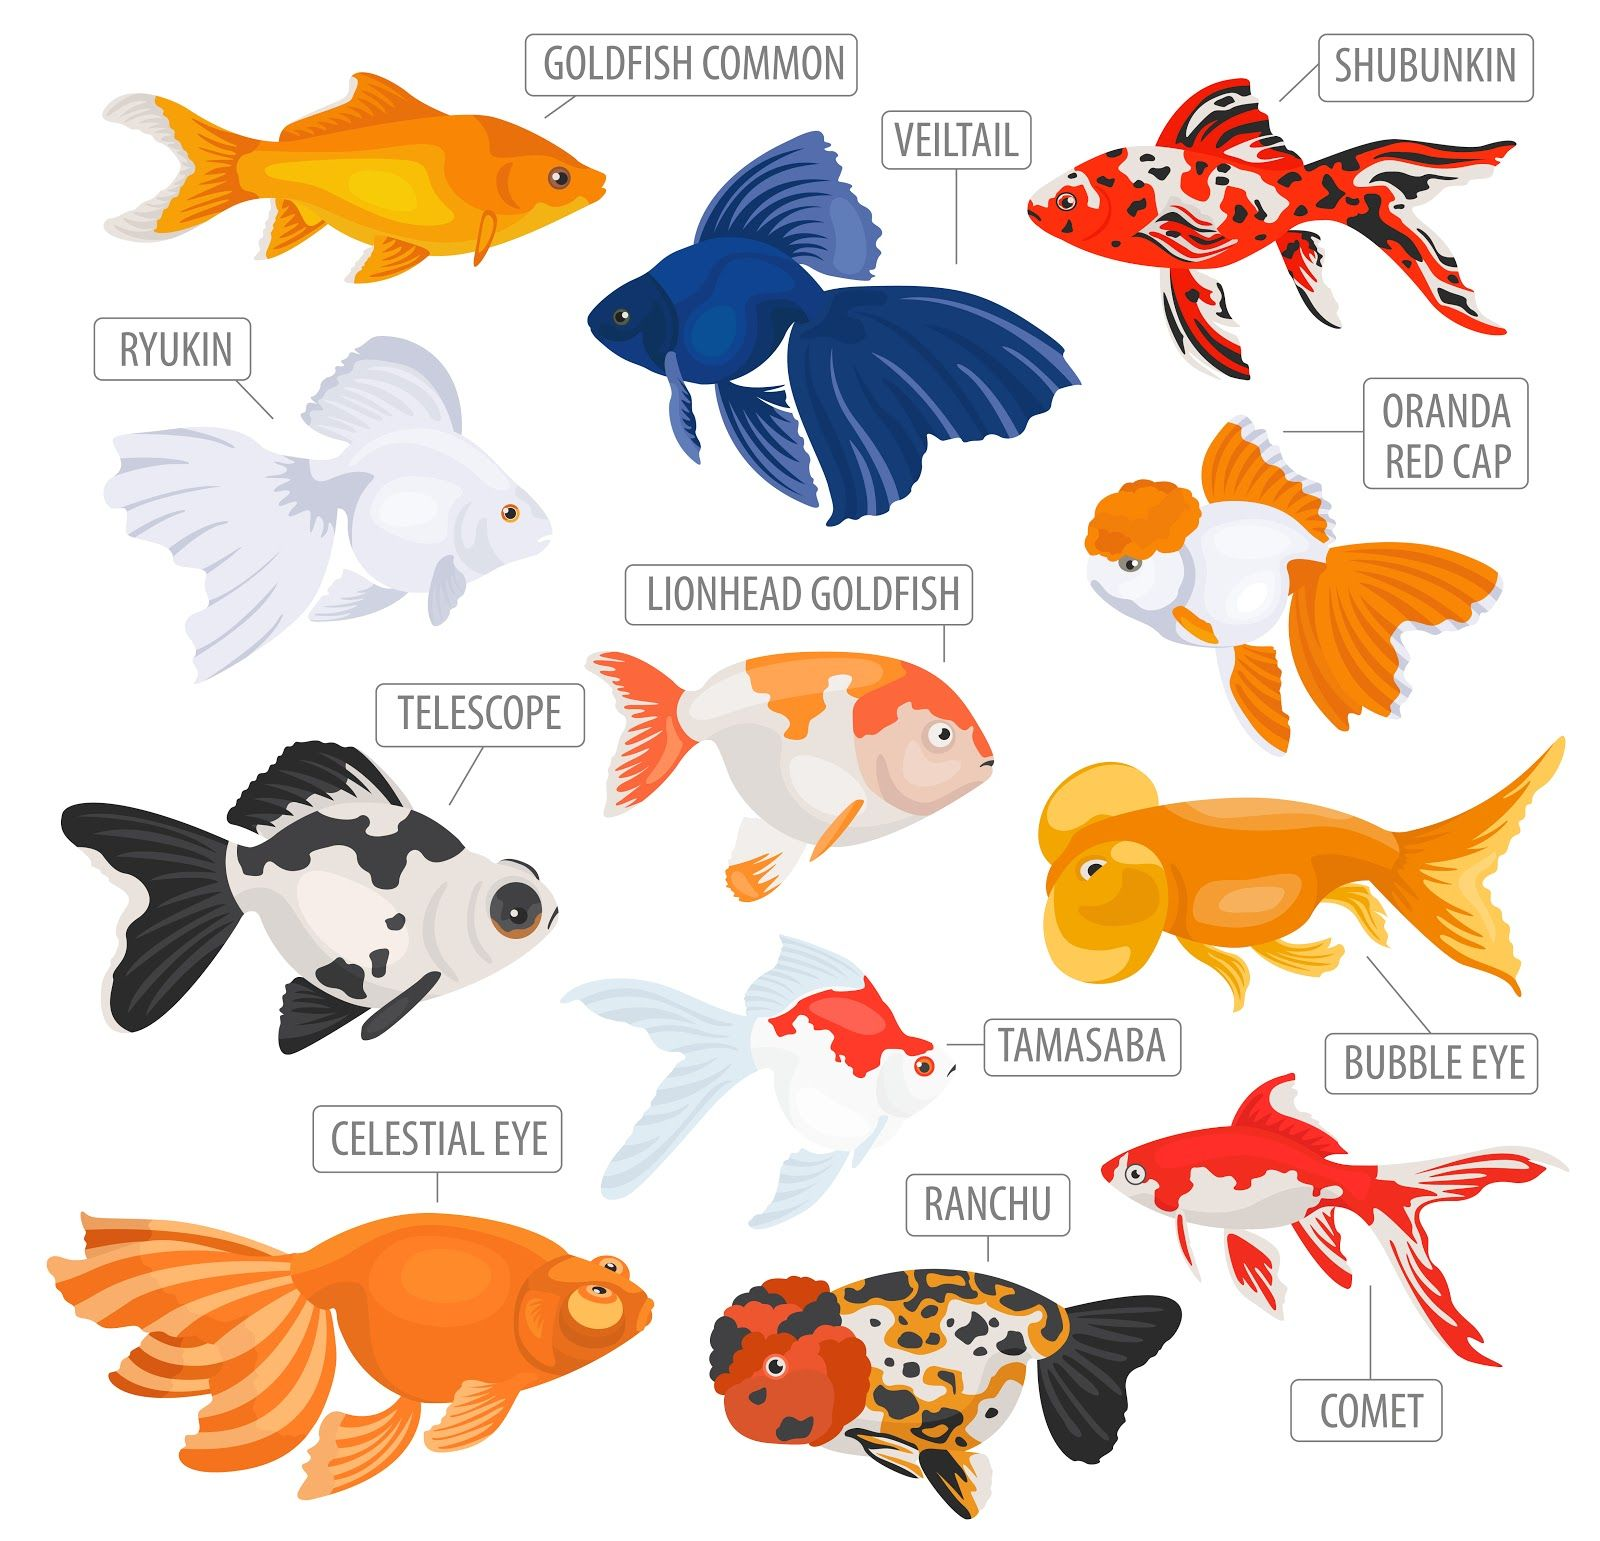 Goldfish Body Types The Different Goldfish Body Types Fish